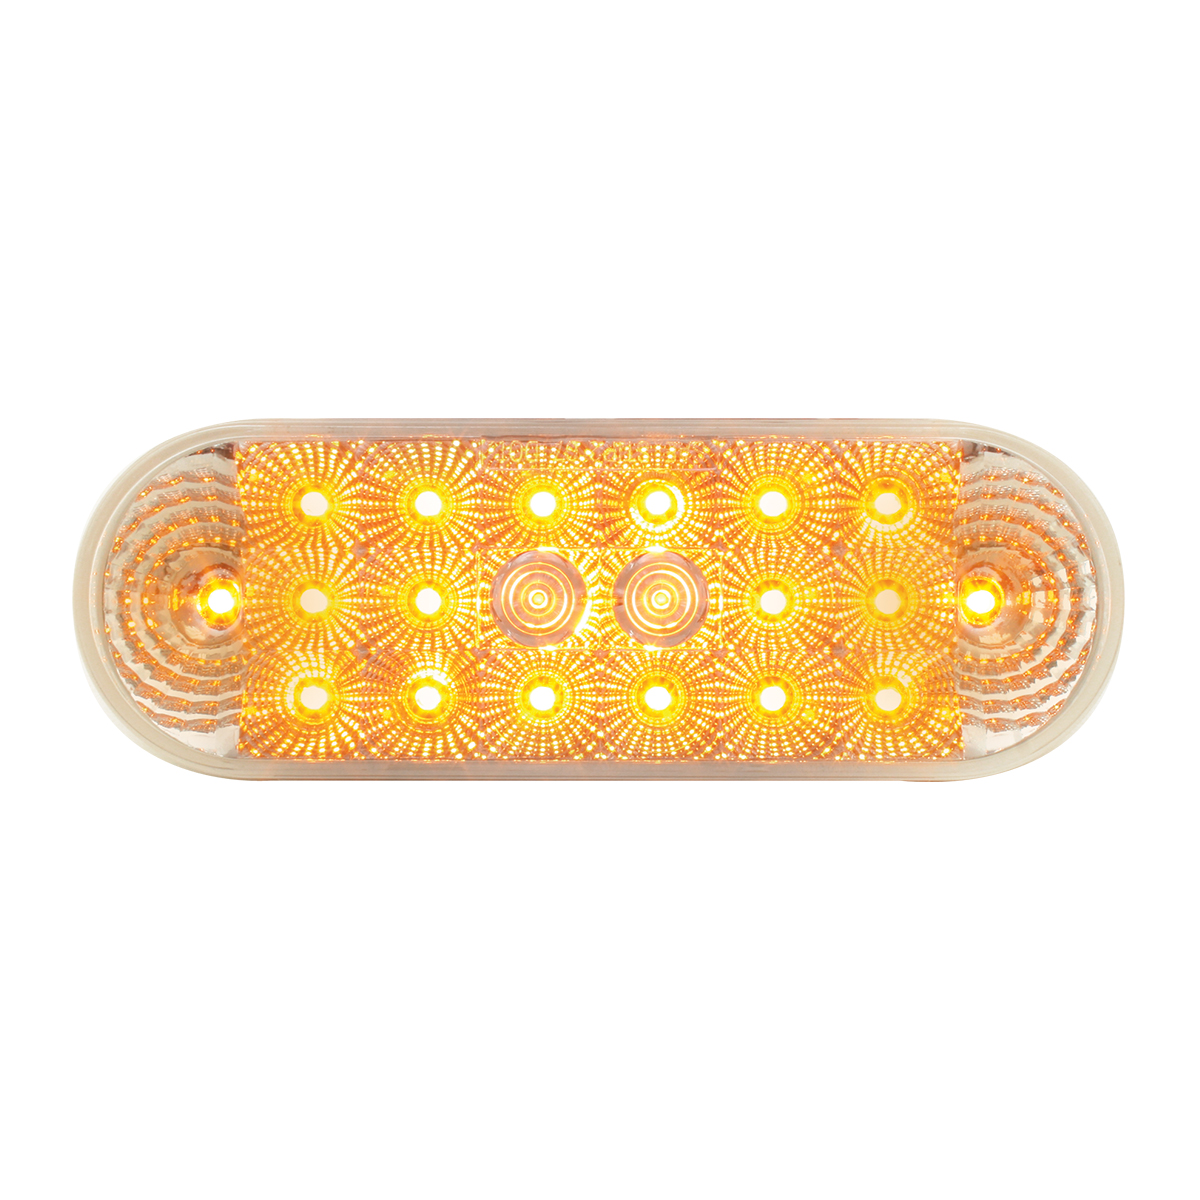 Oval Low Profile Spyder Amber 20, Clear Lens Grand General 77051BP LED Light